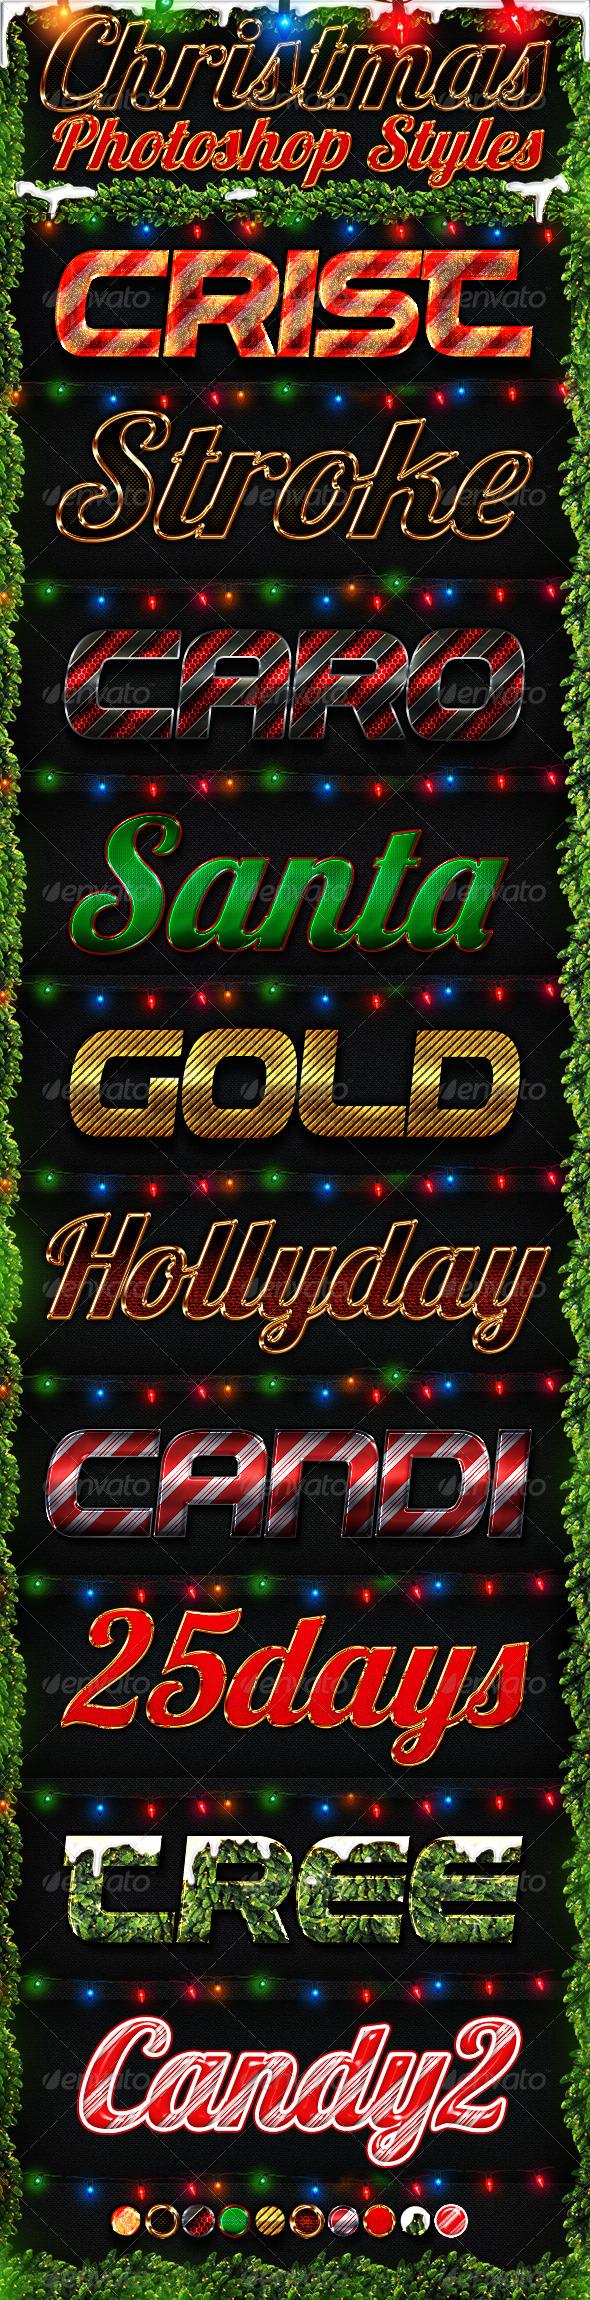 Christmas Photoshop Styles